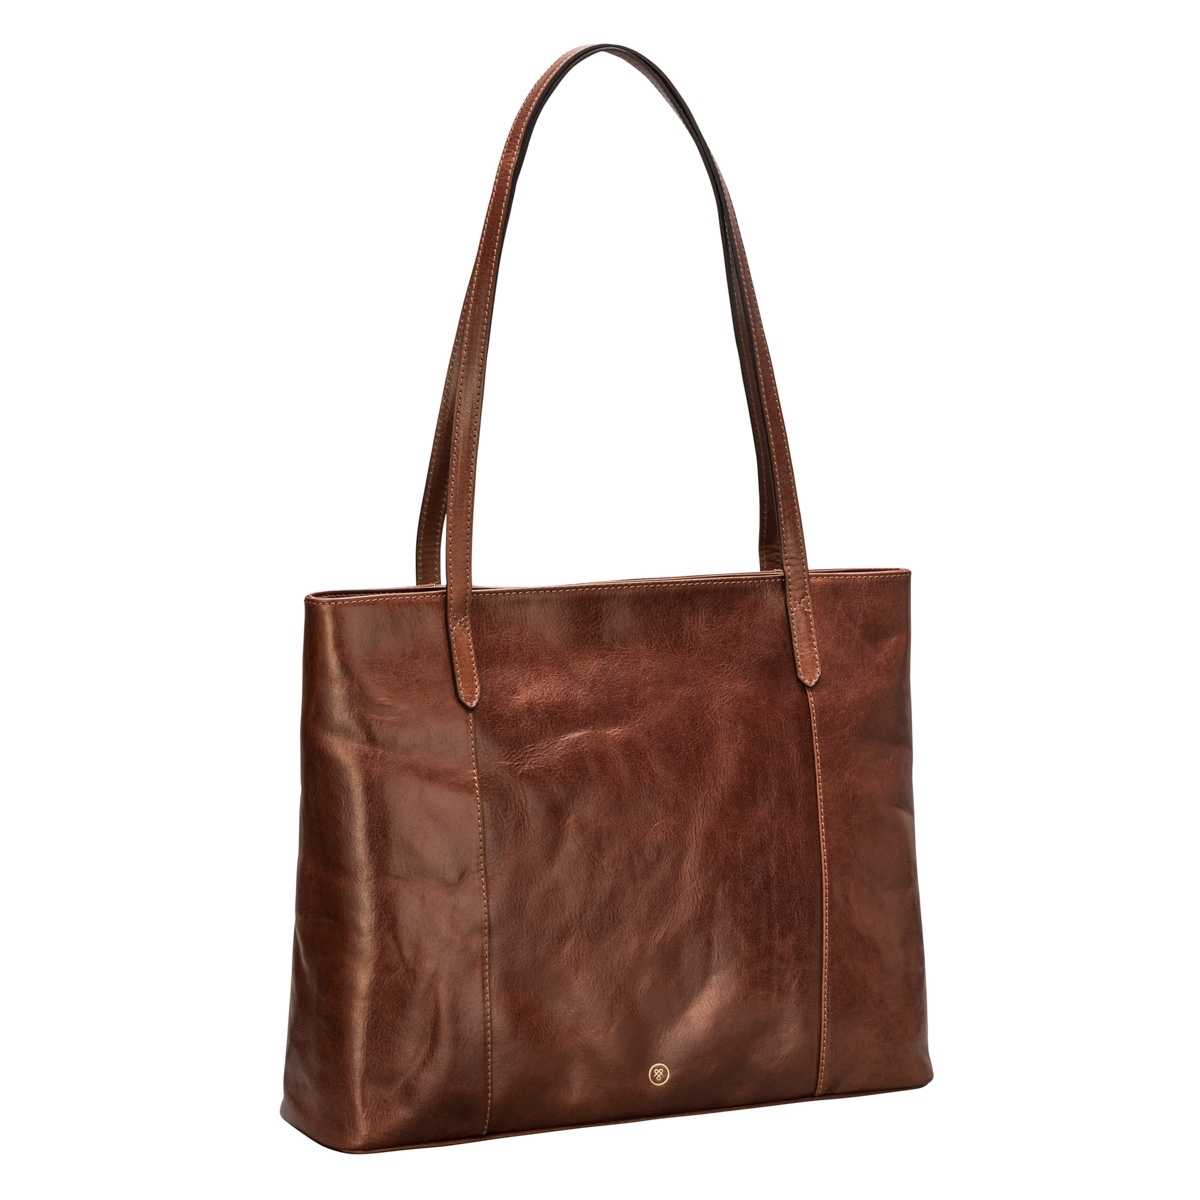 MAXWELL SCOTT BAGS Women S Classic Large Leather Shopper Bag